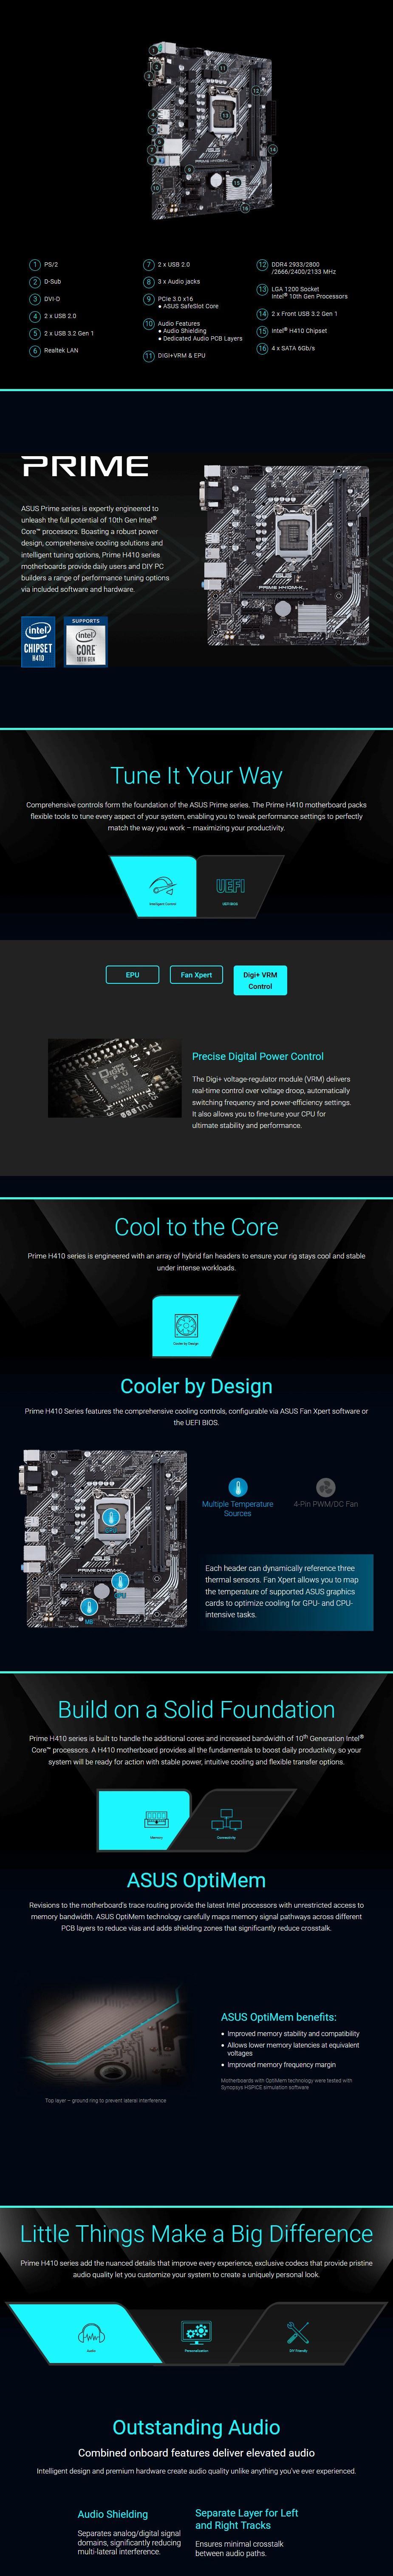 ASUS PRIME H410M-K LGA 1200 Micro-ATX Motherboard - Overview 1